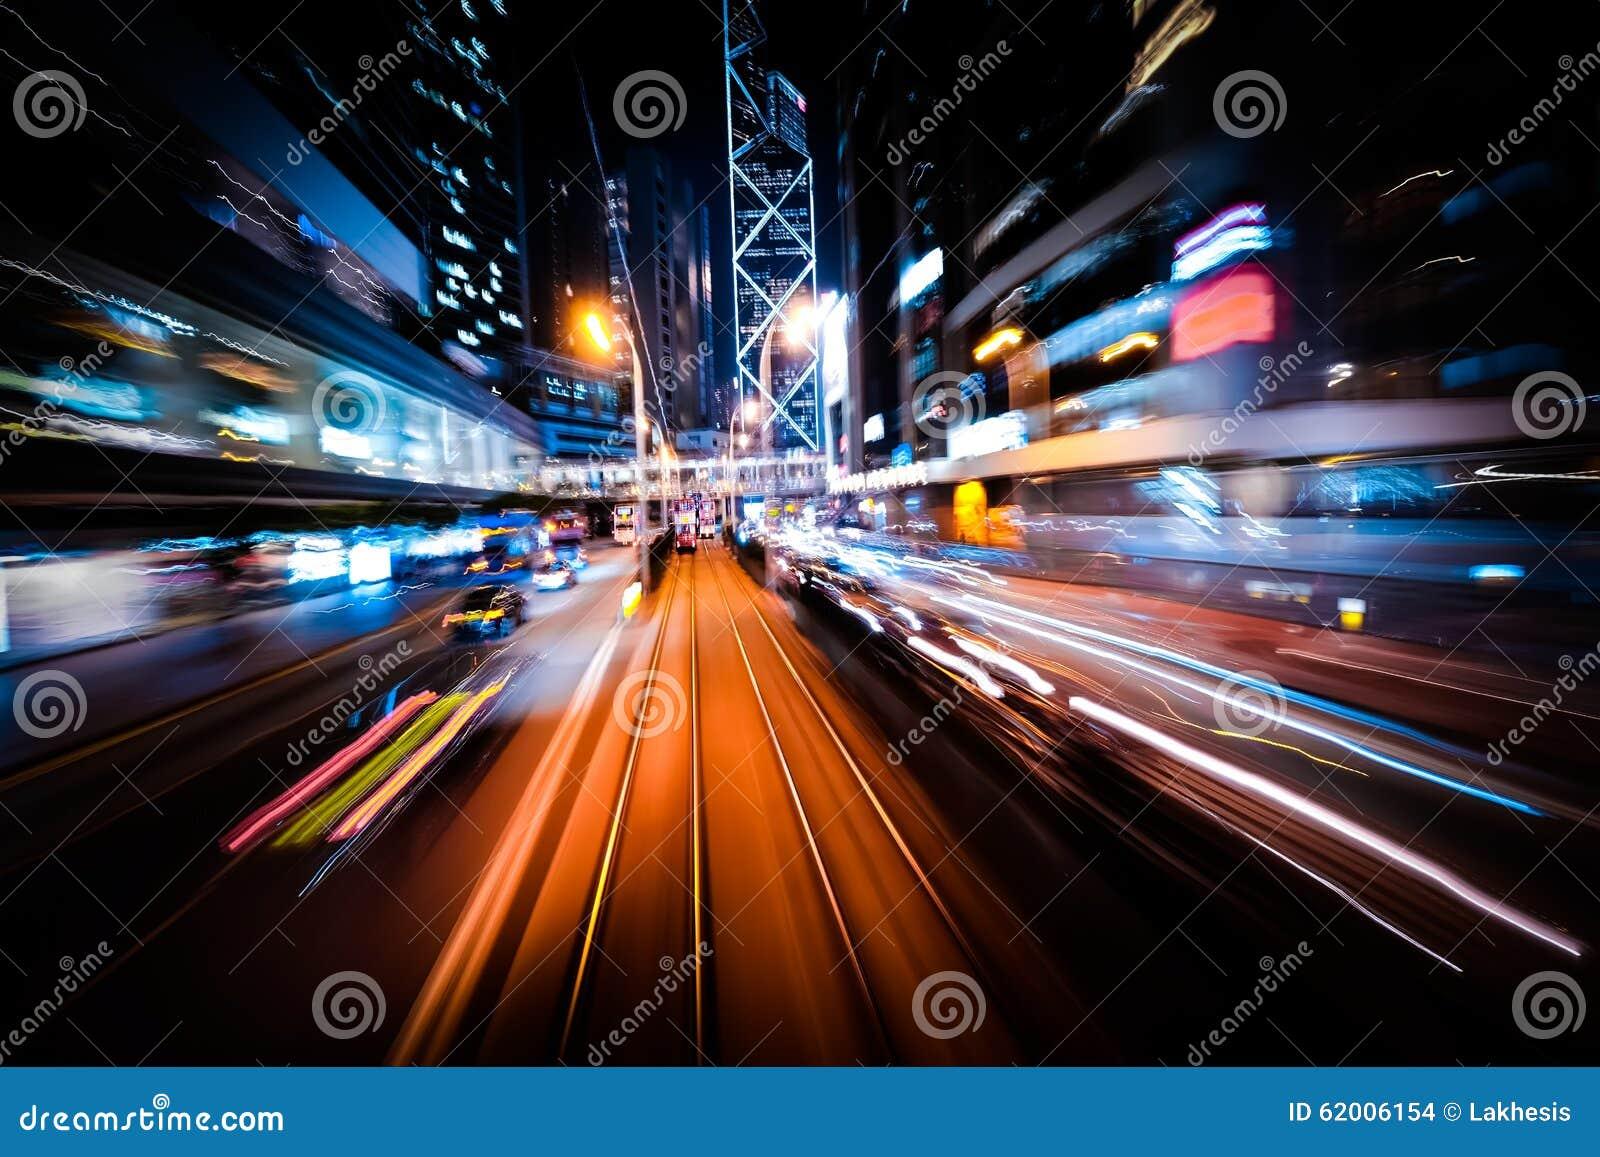 Modern city motion blur. Hong Kong. Abstract cityscape traffic